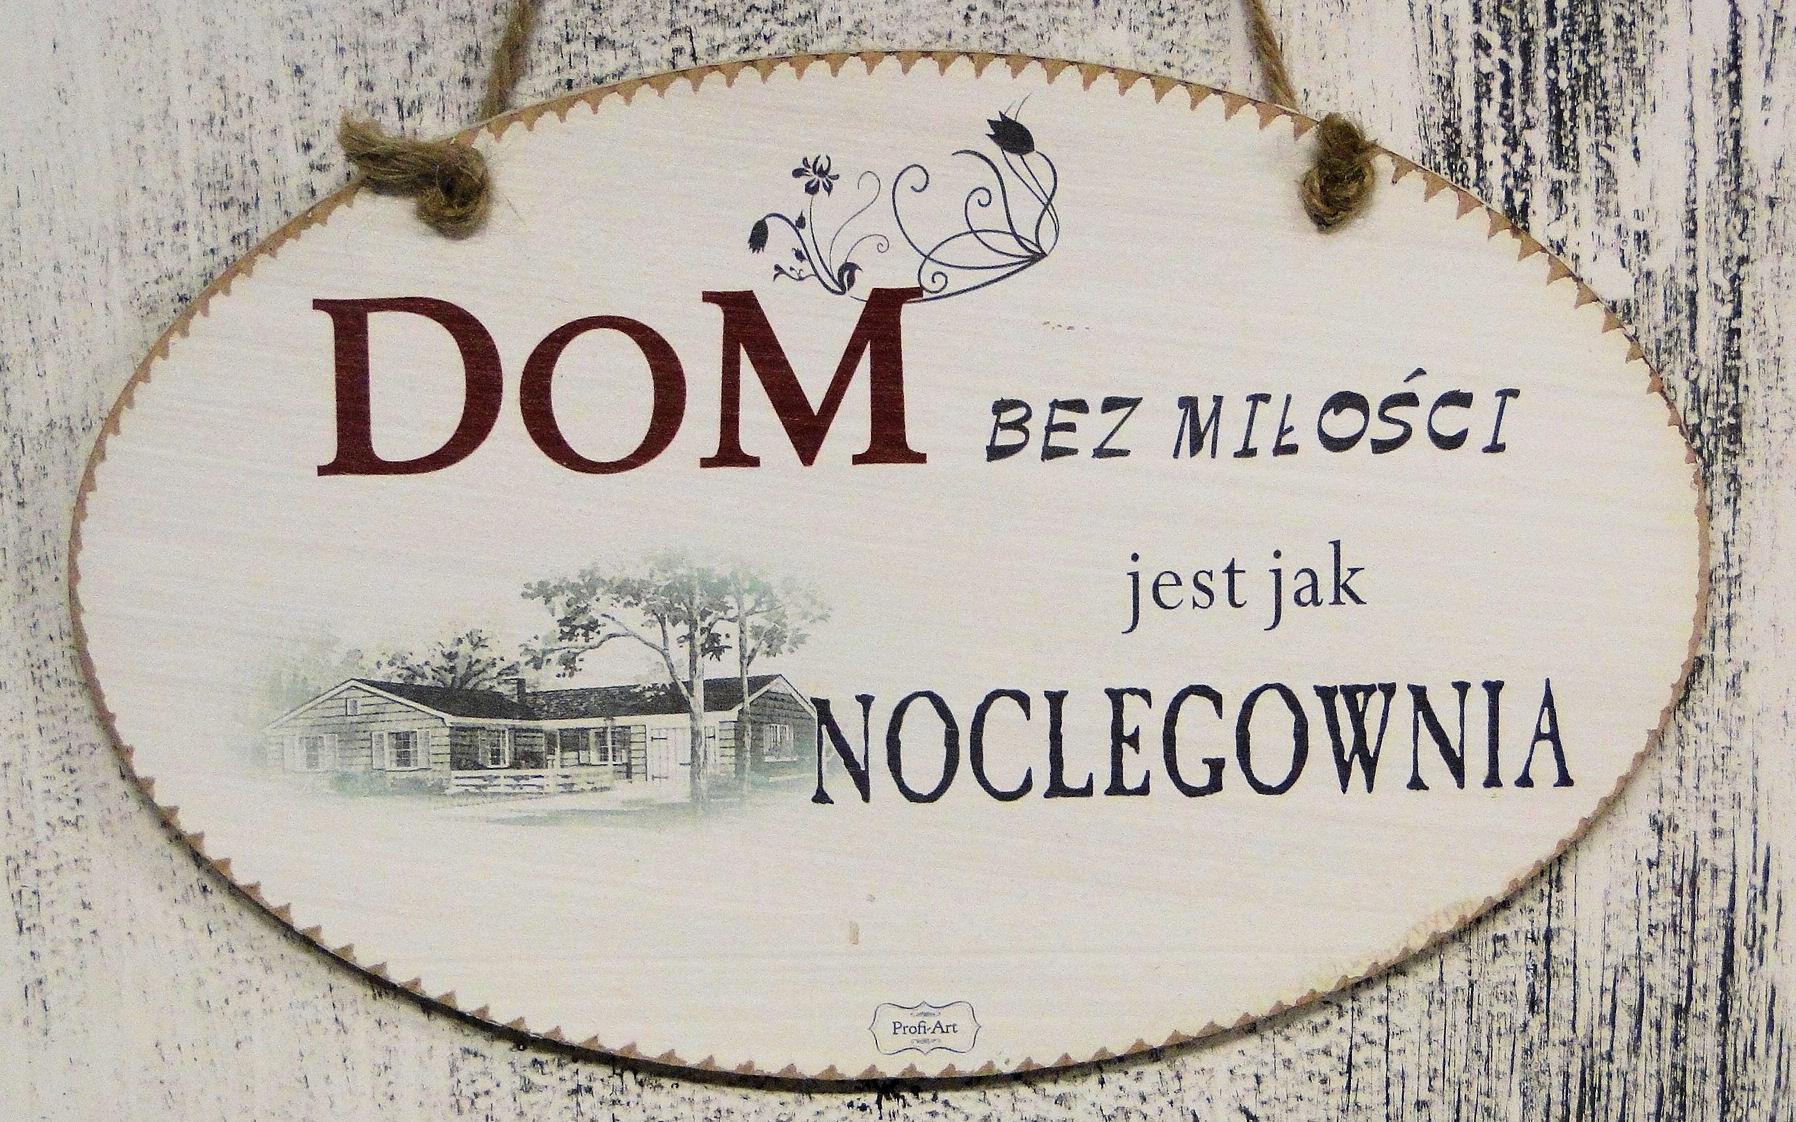 DOM BEZ MIŁOŚCI TV719.jpg